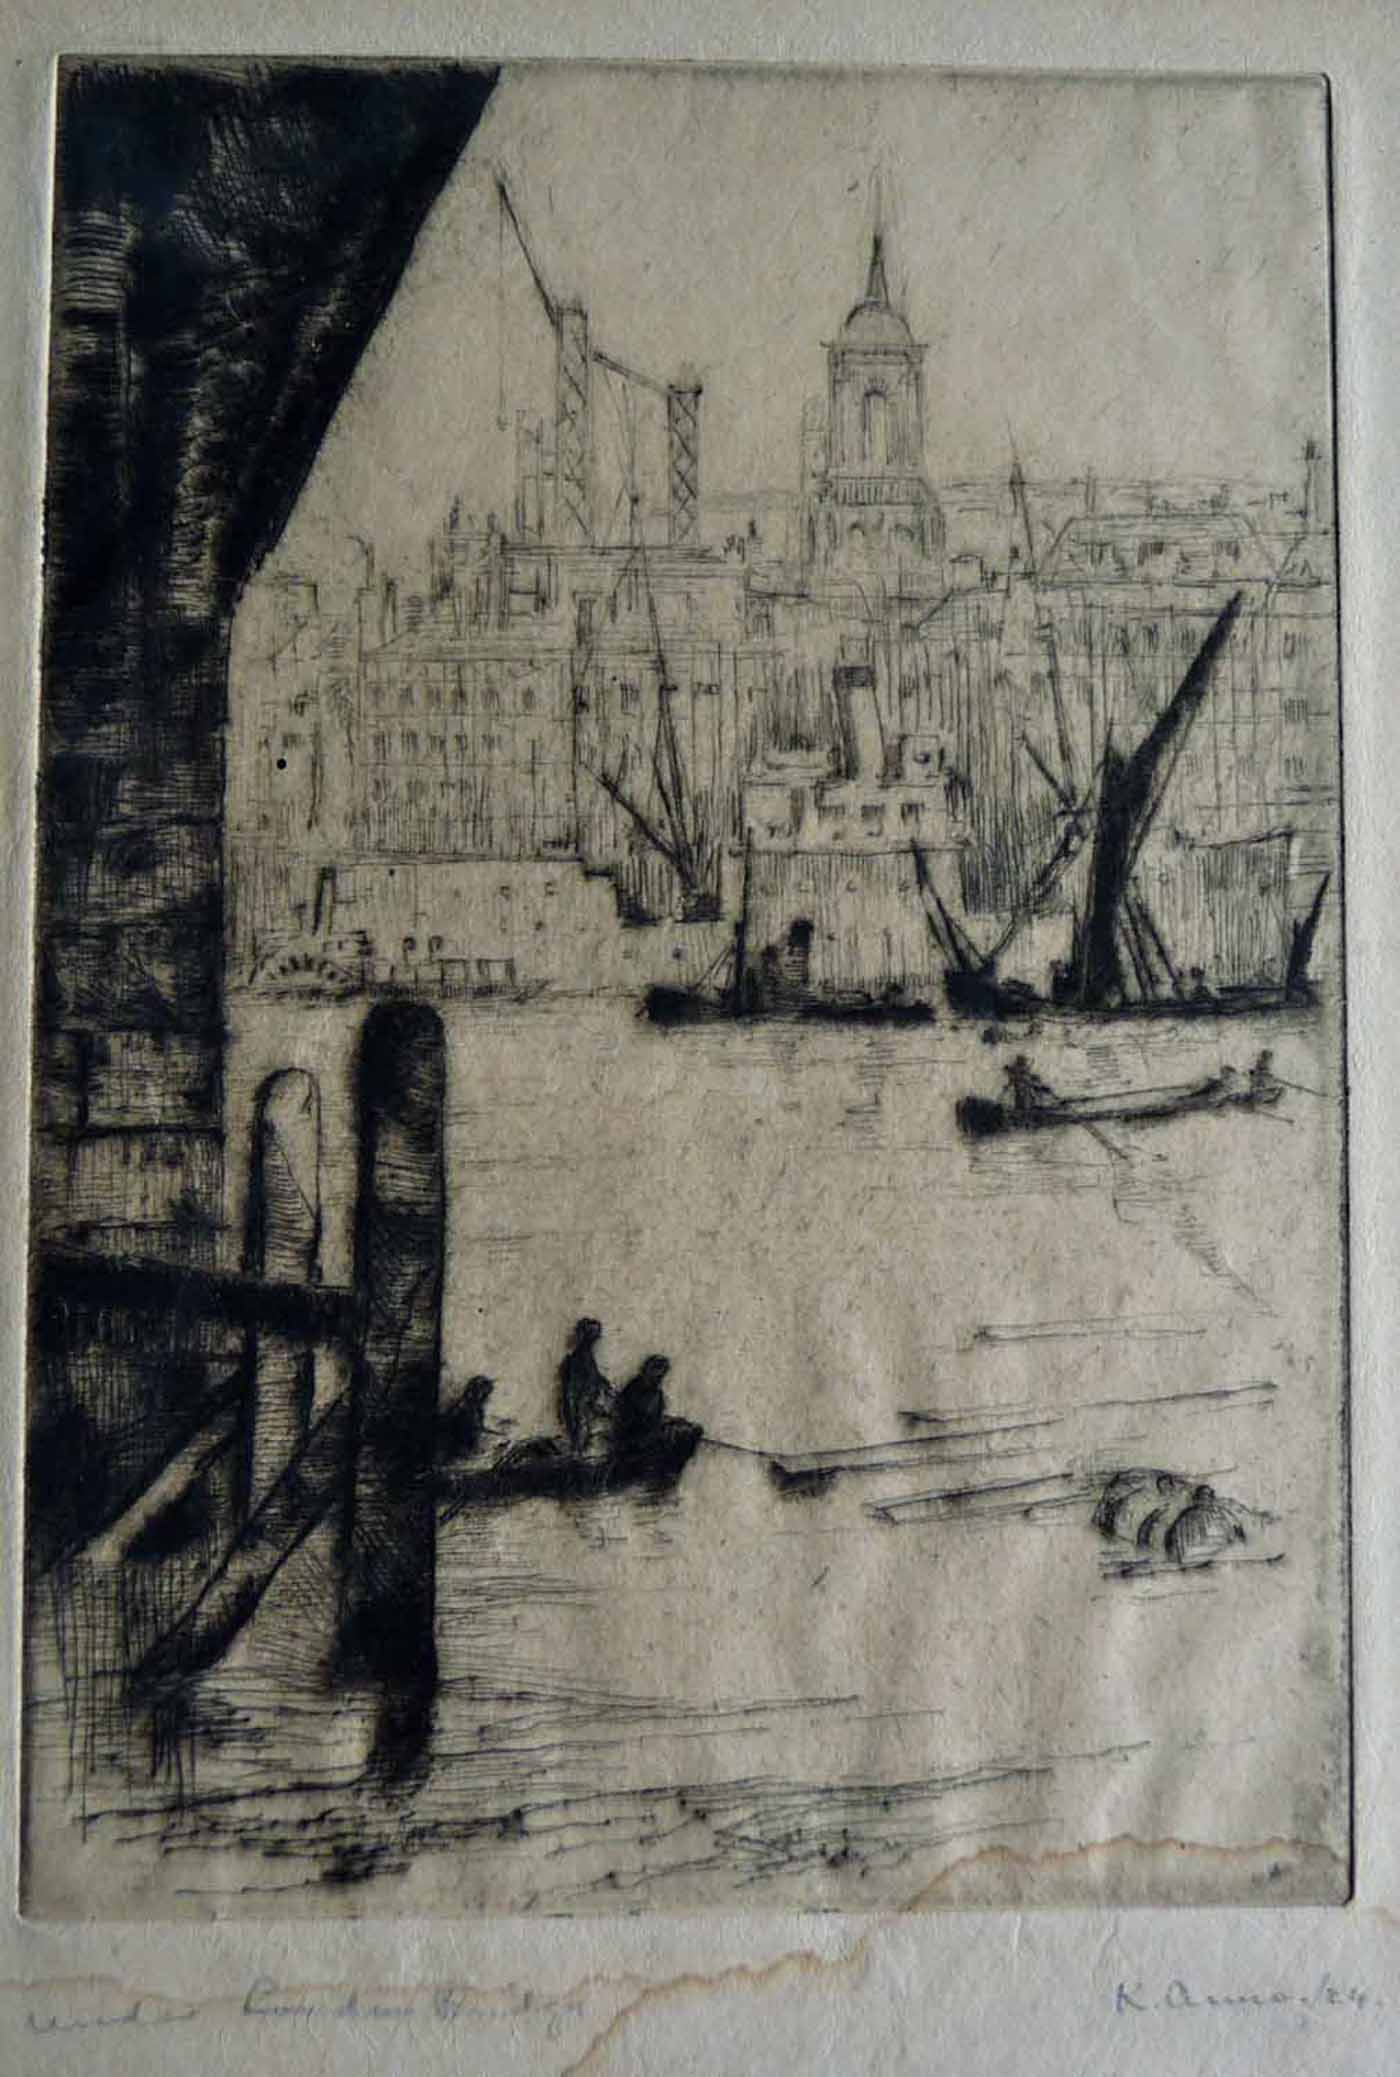 Under London Bridge, 1924 drypoint engraving